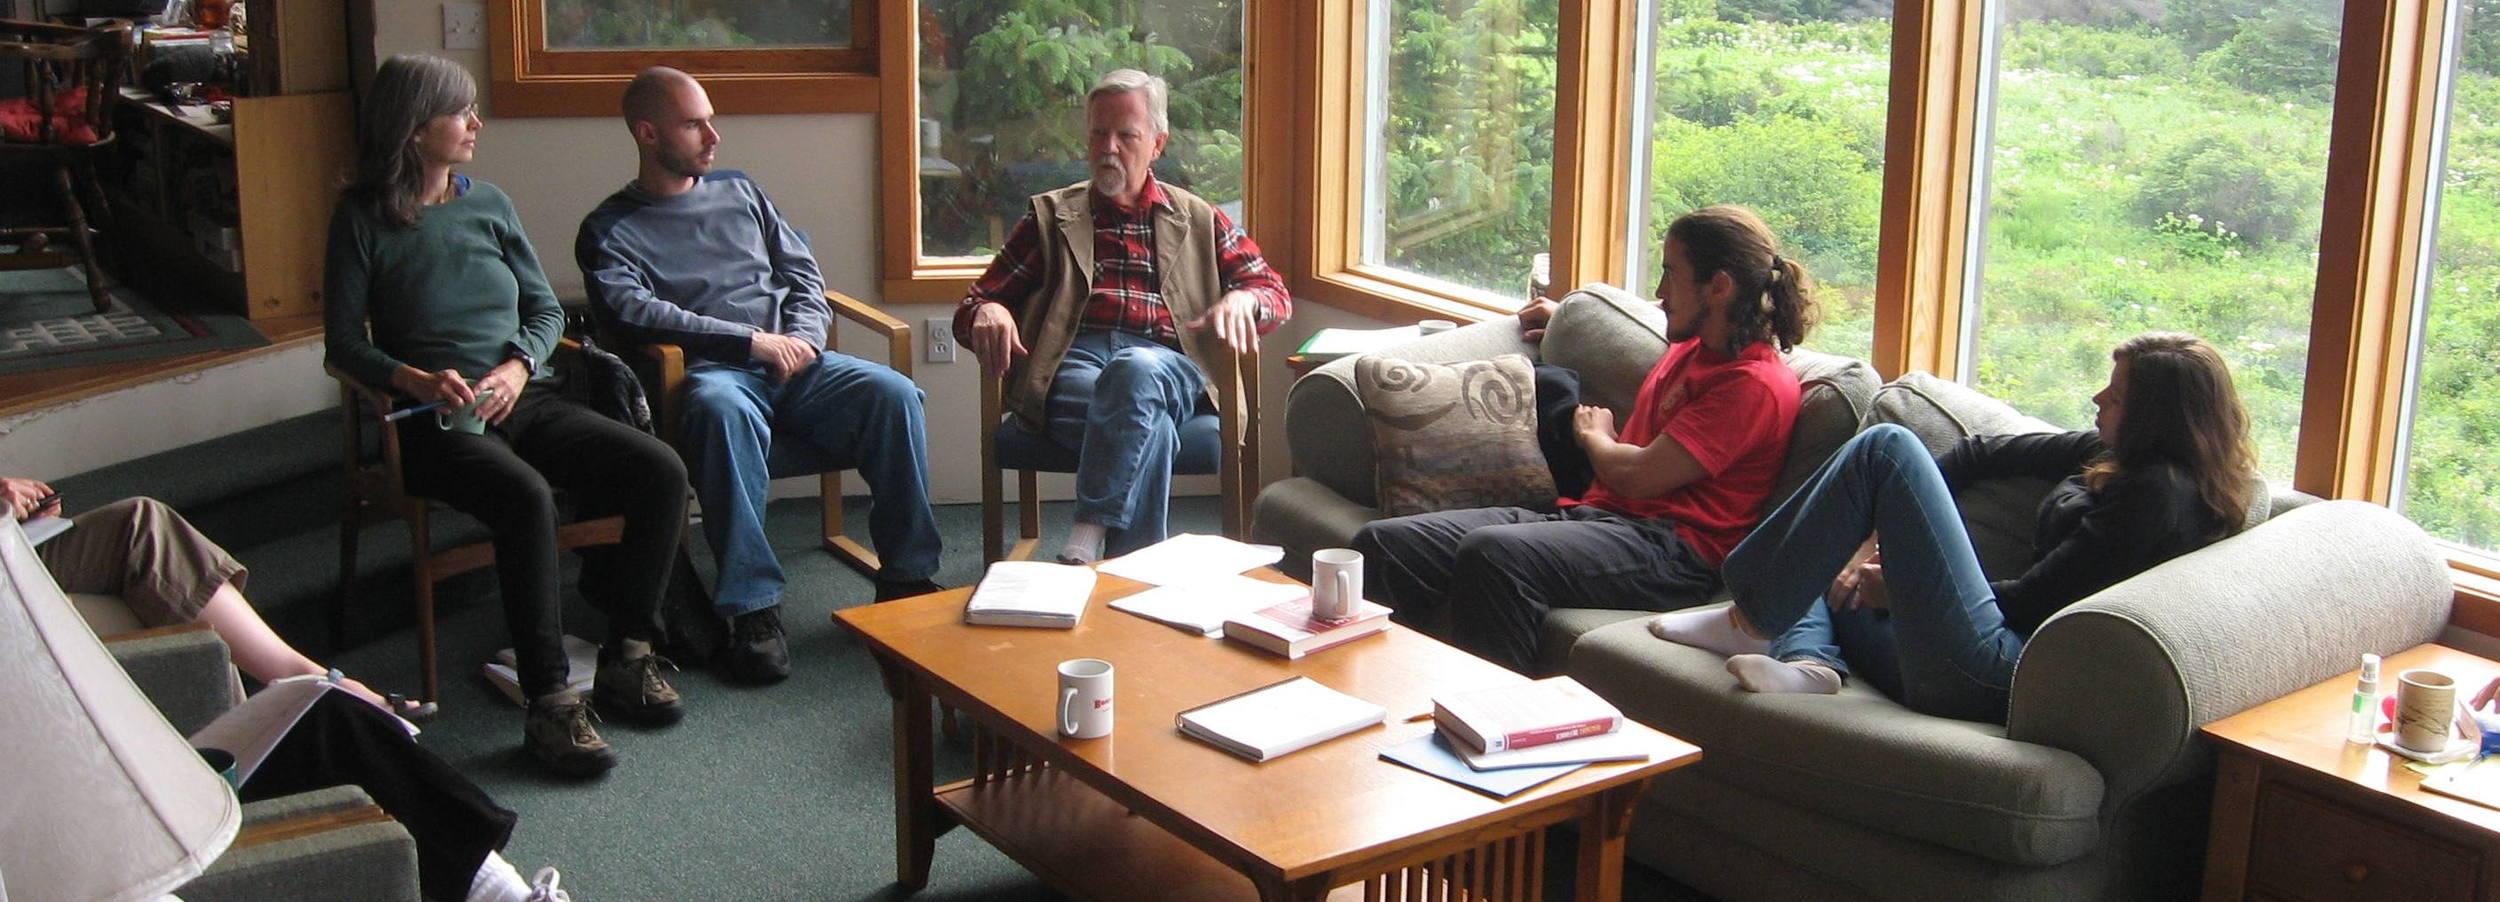 Workshop on Yukon Island, Alaska